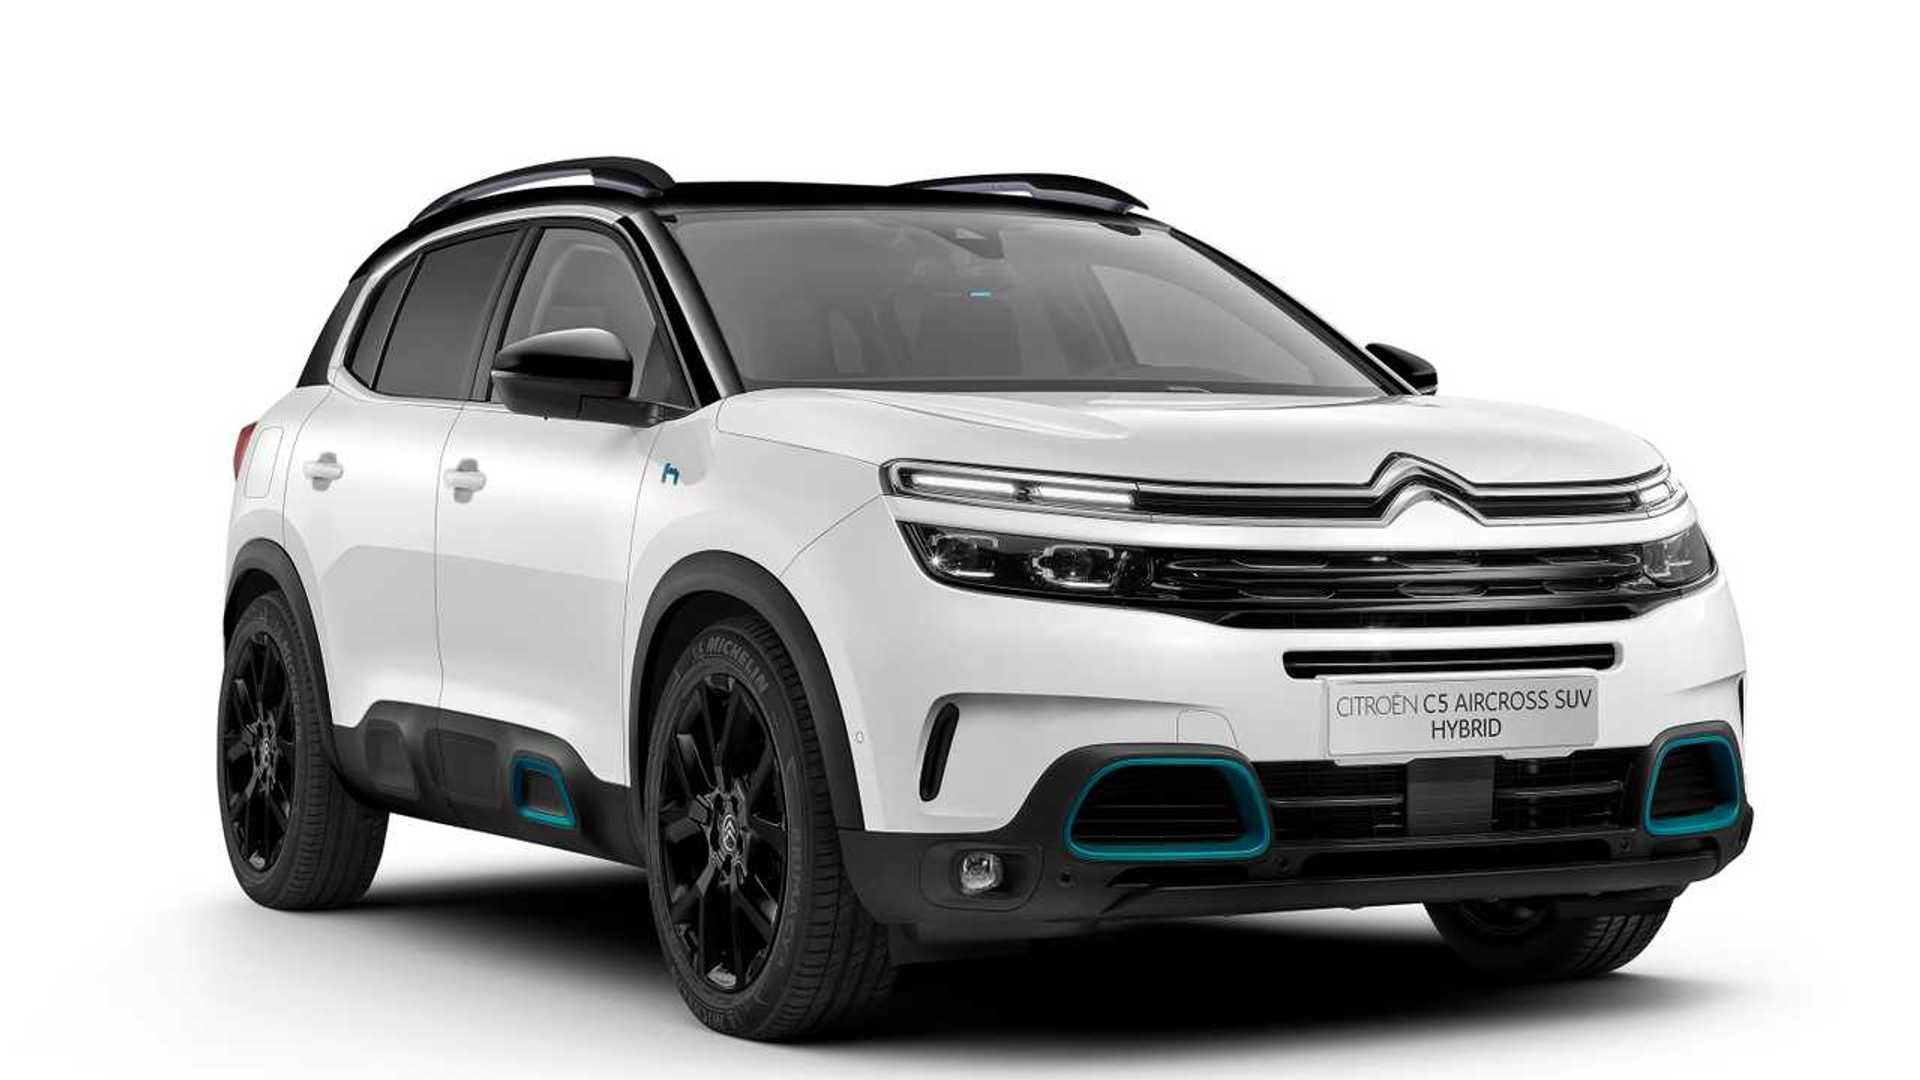 Citroën C5 Aircross Hybrid (2020) - Toutes les infos ...